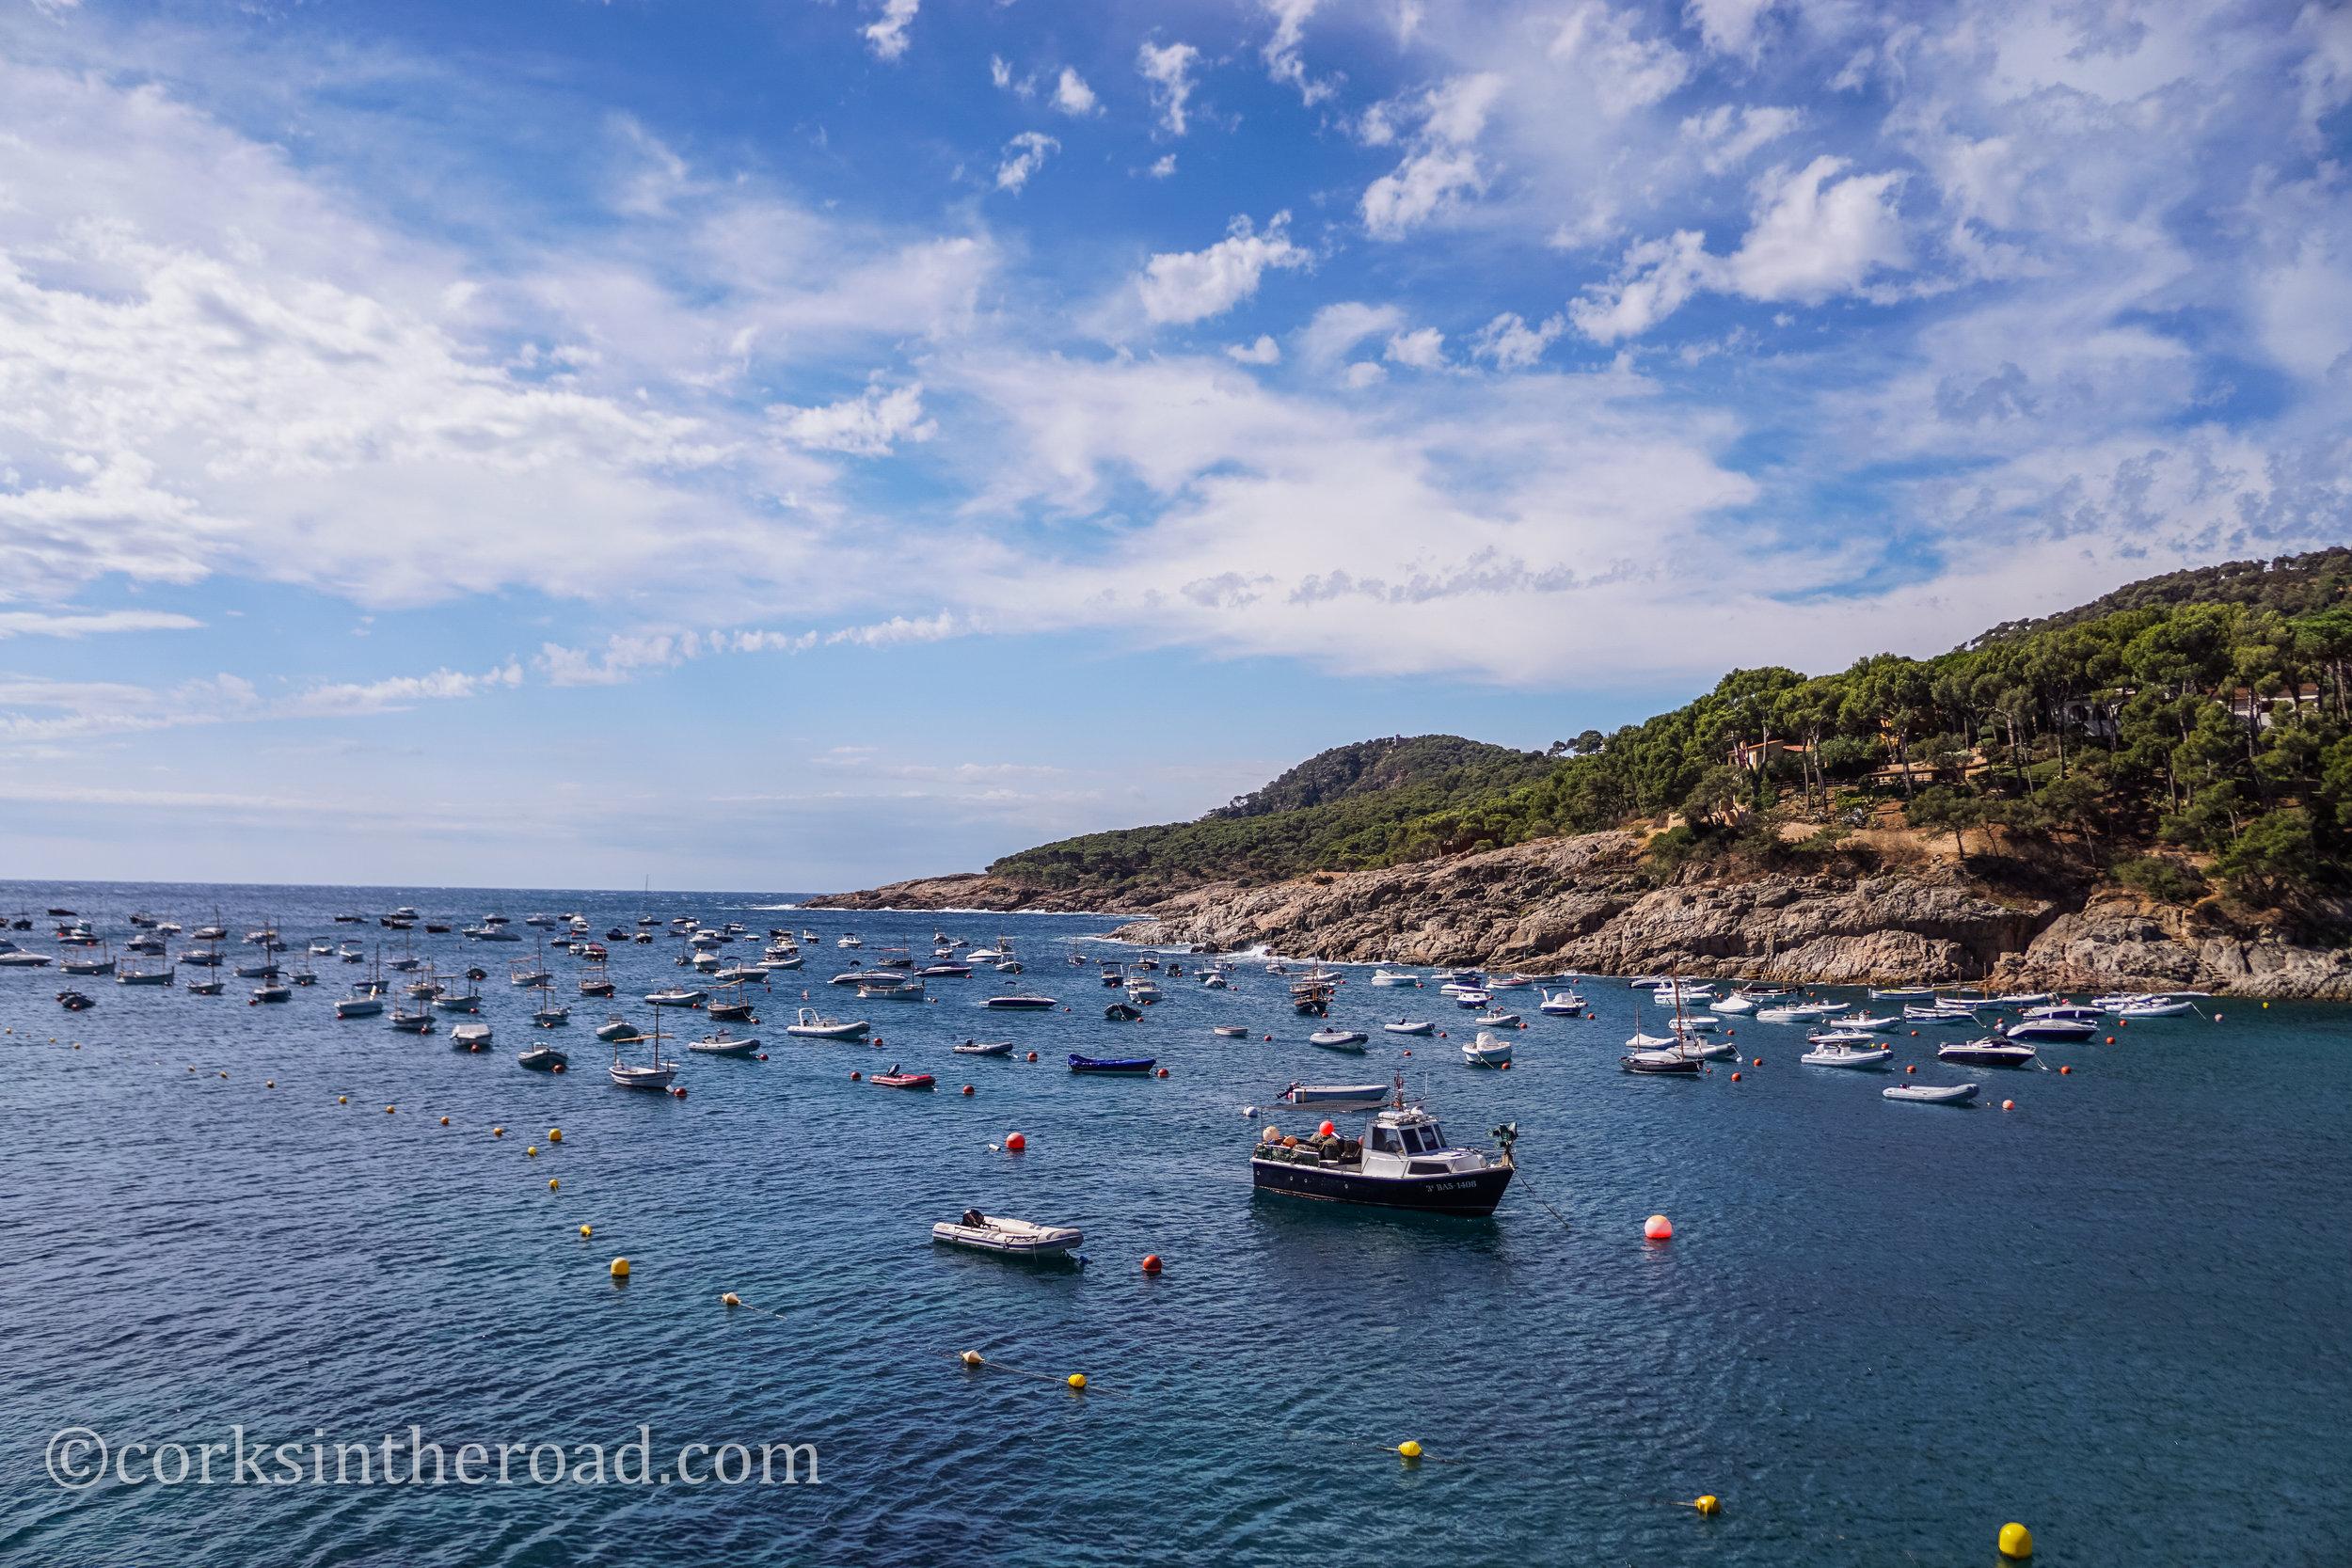 20160810Barcelona, Corksintheroad, Costa Brava, Costa Brava Landscape-9.jpg